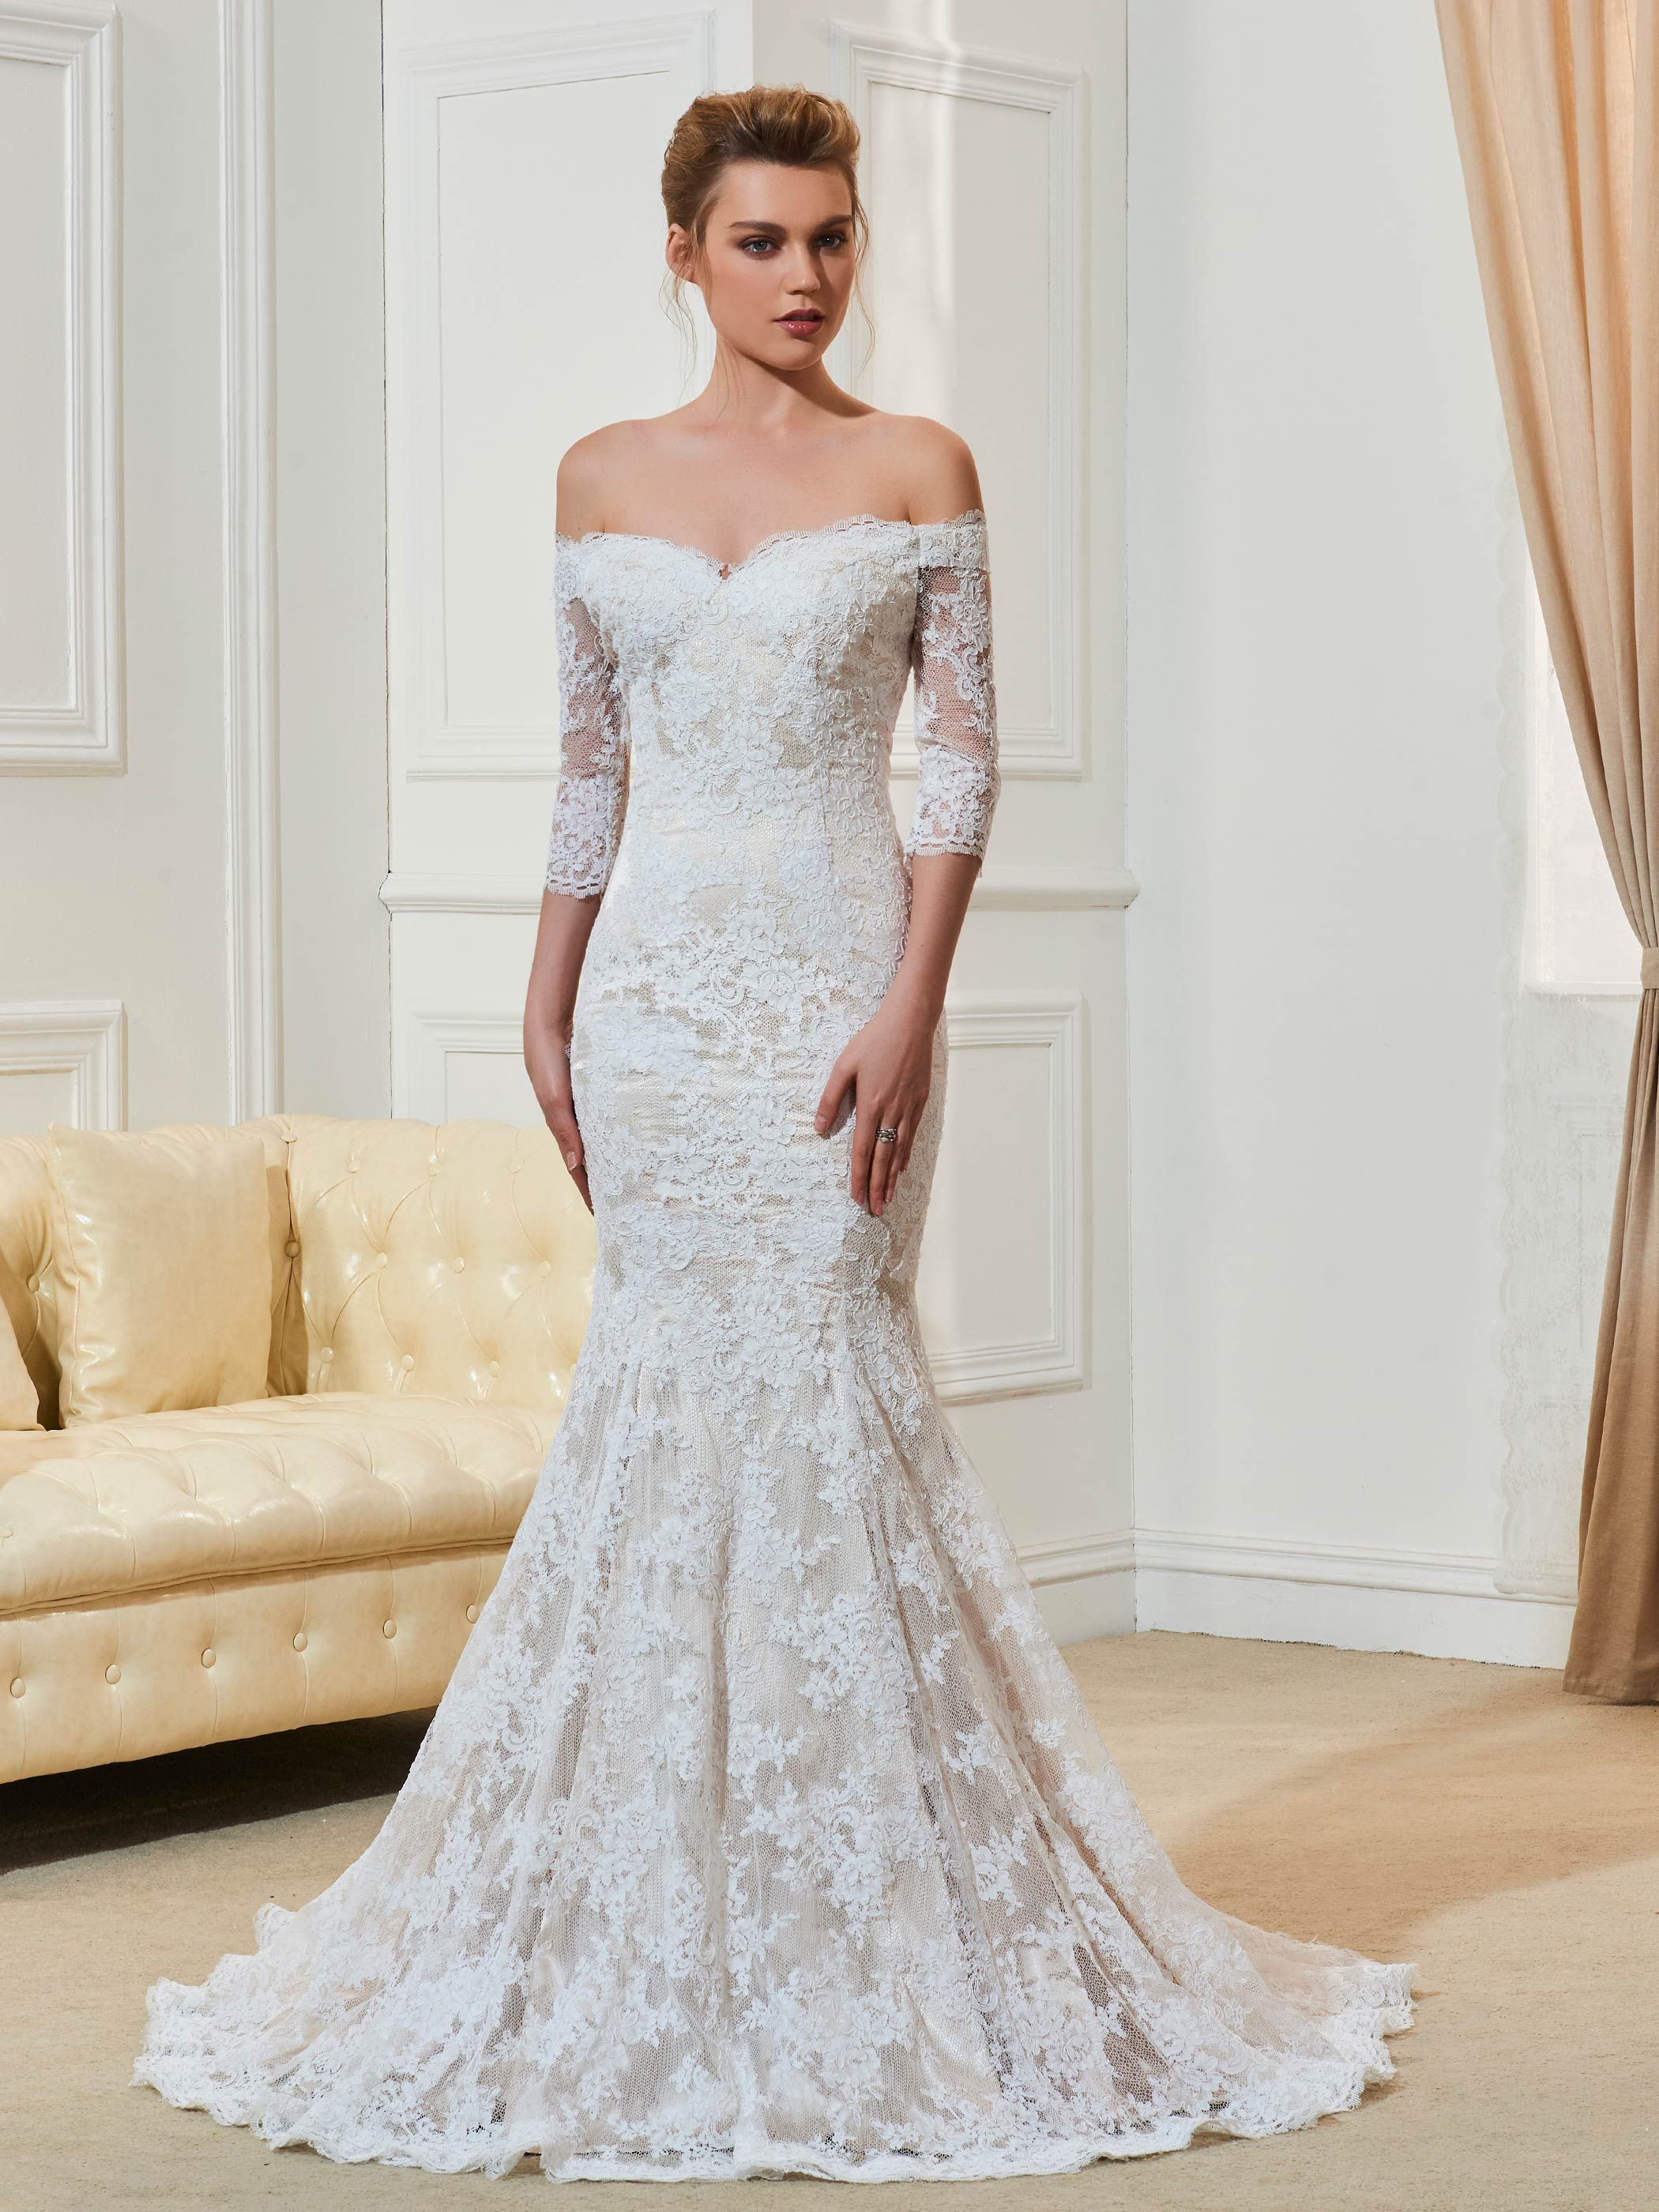 Off the Shoulder Half Sleeve Lace Mermaid Wedding Dress